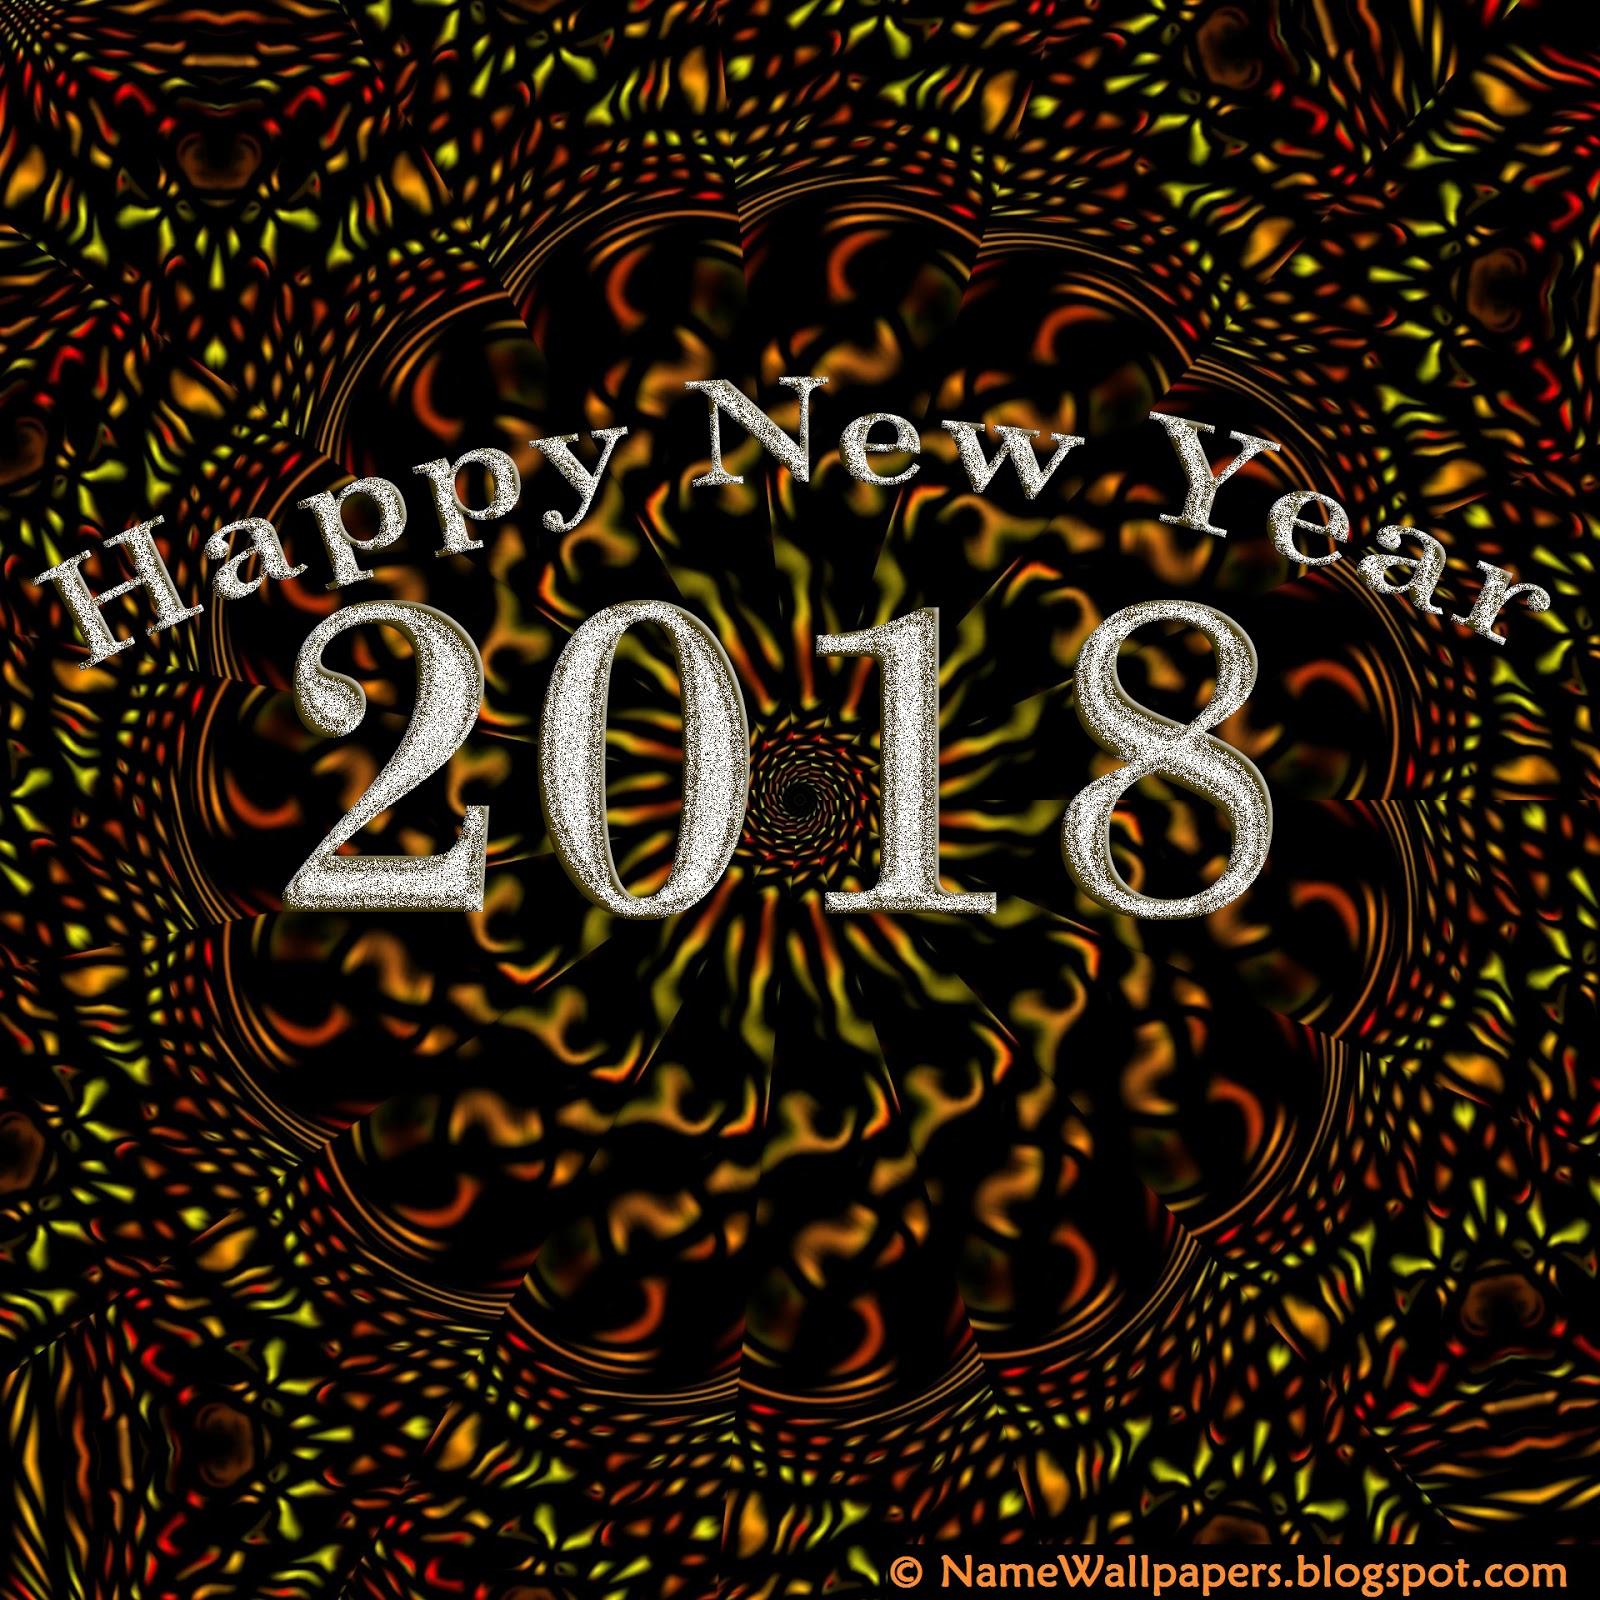 Happy New Year 2018 Images HD  Happy New Year 2018 Images